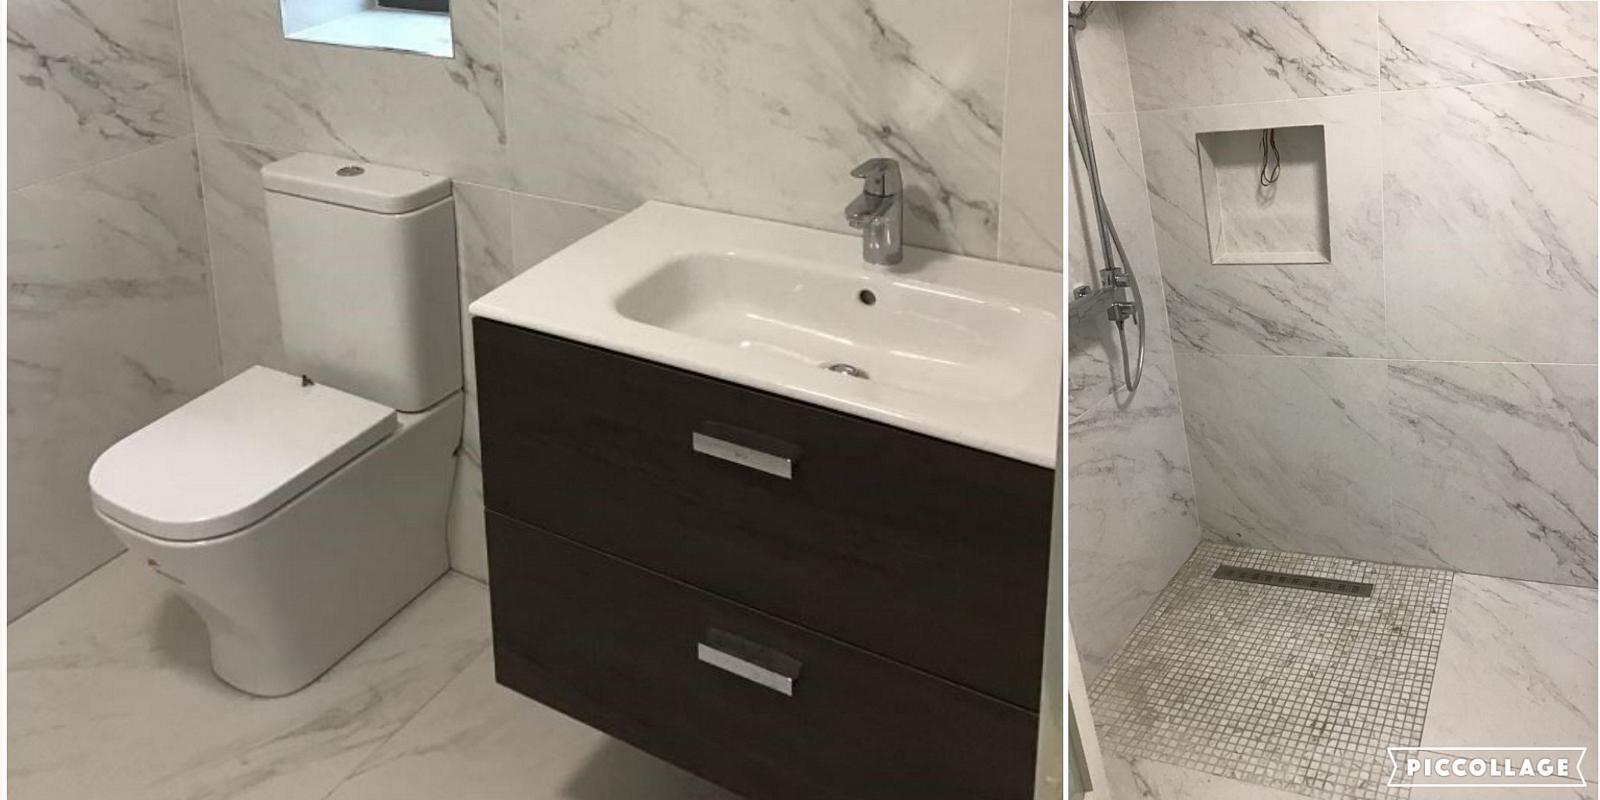 Bathroom Refit and Design